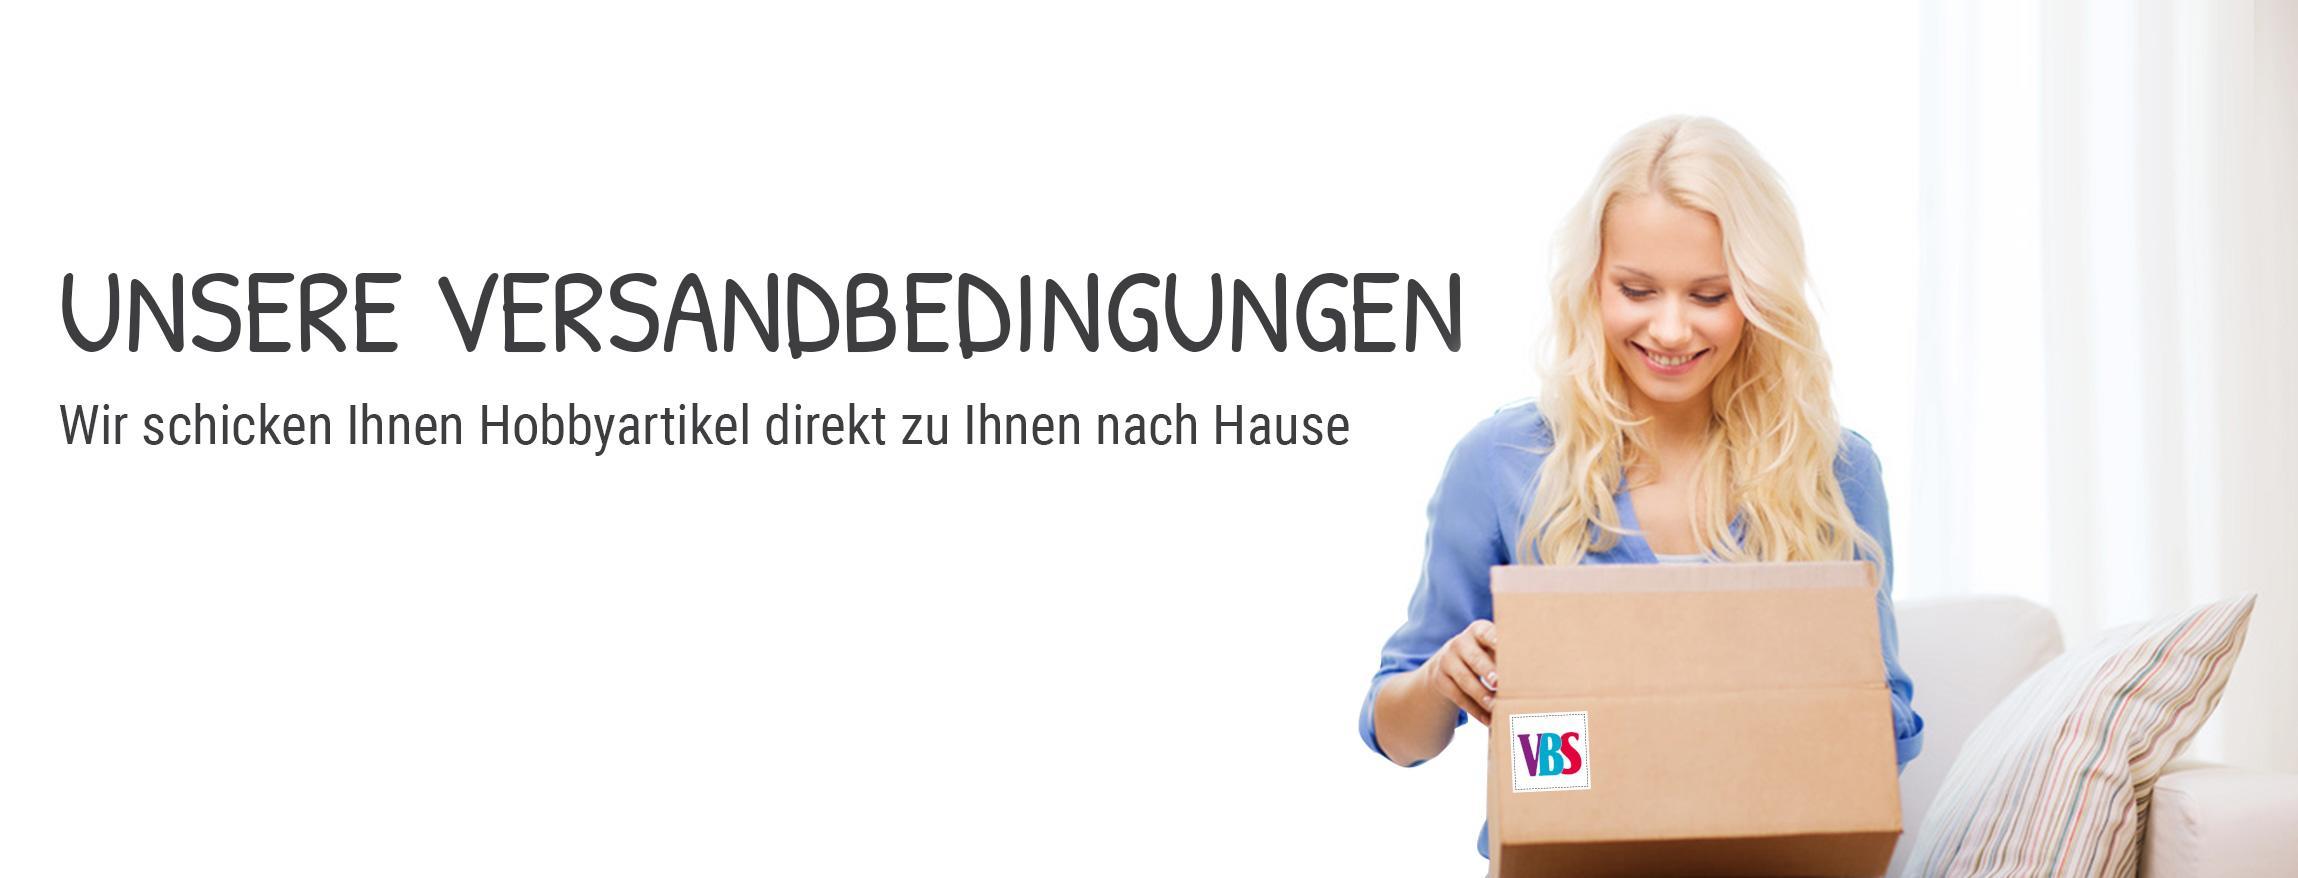 VBS Versandbedingungen